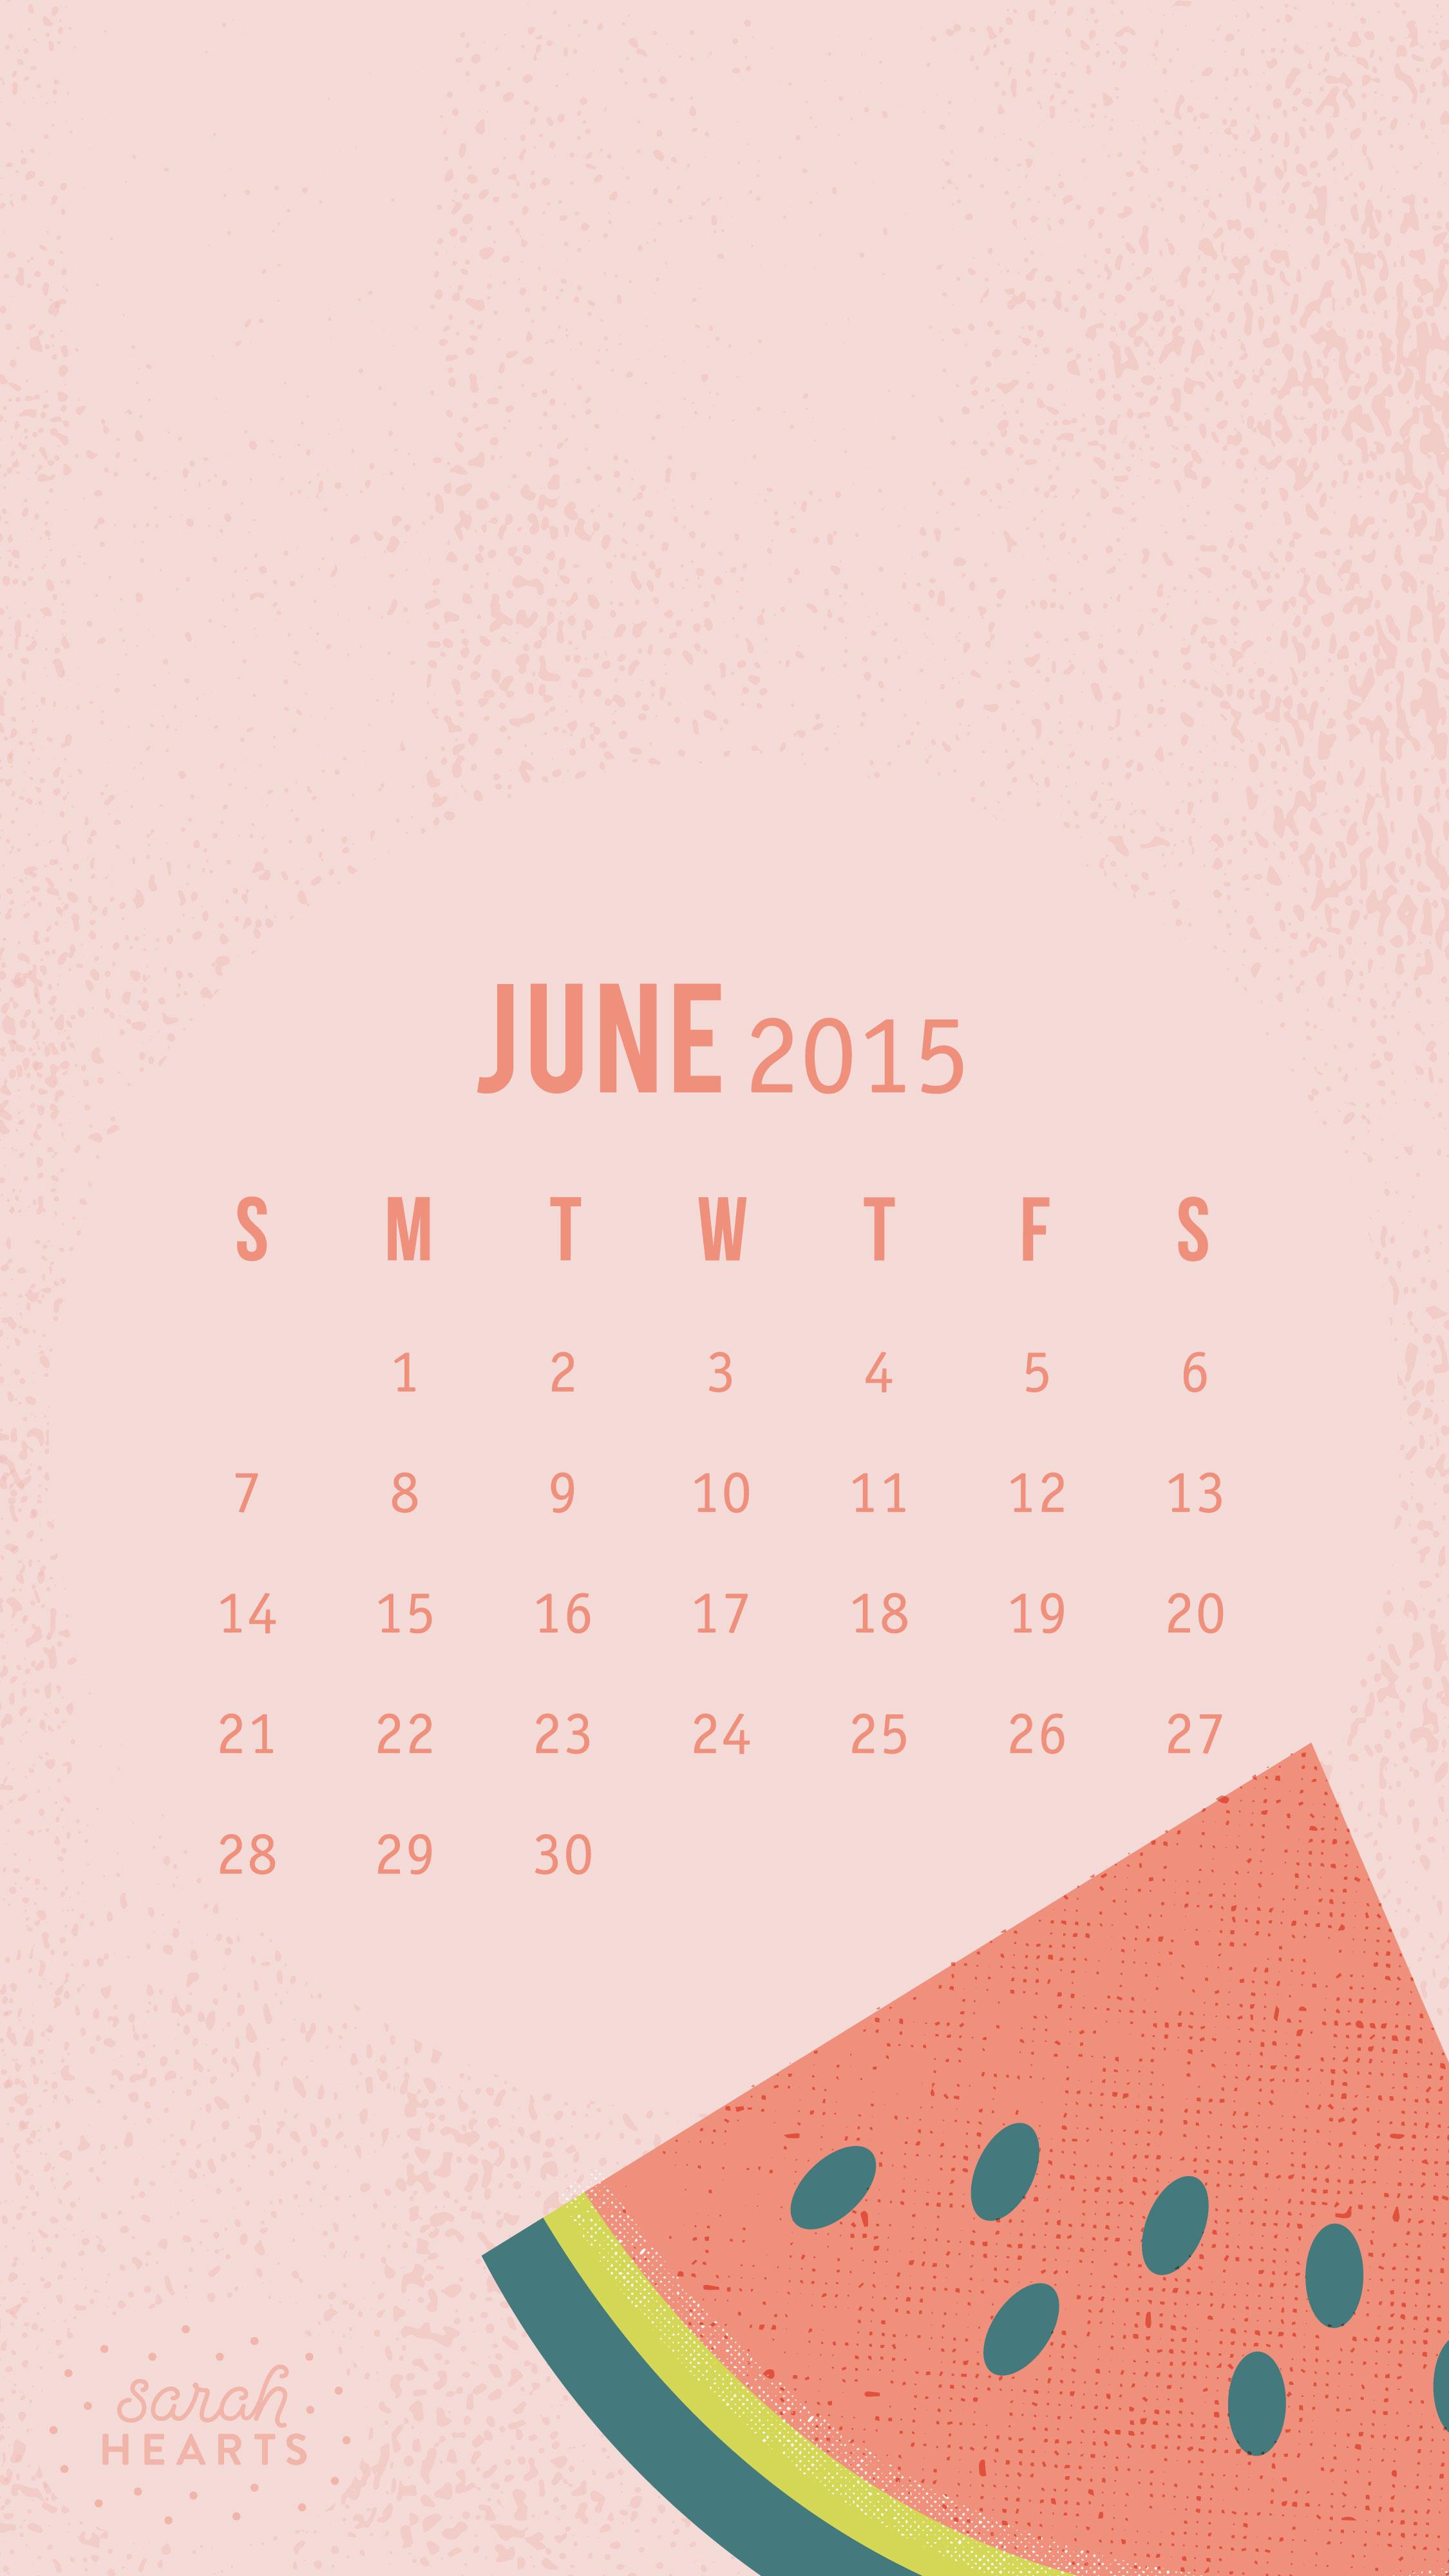 Graphic Designer Quote Wallpaper June 2015 Calendar Wallpaper Sarah Hearts